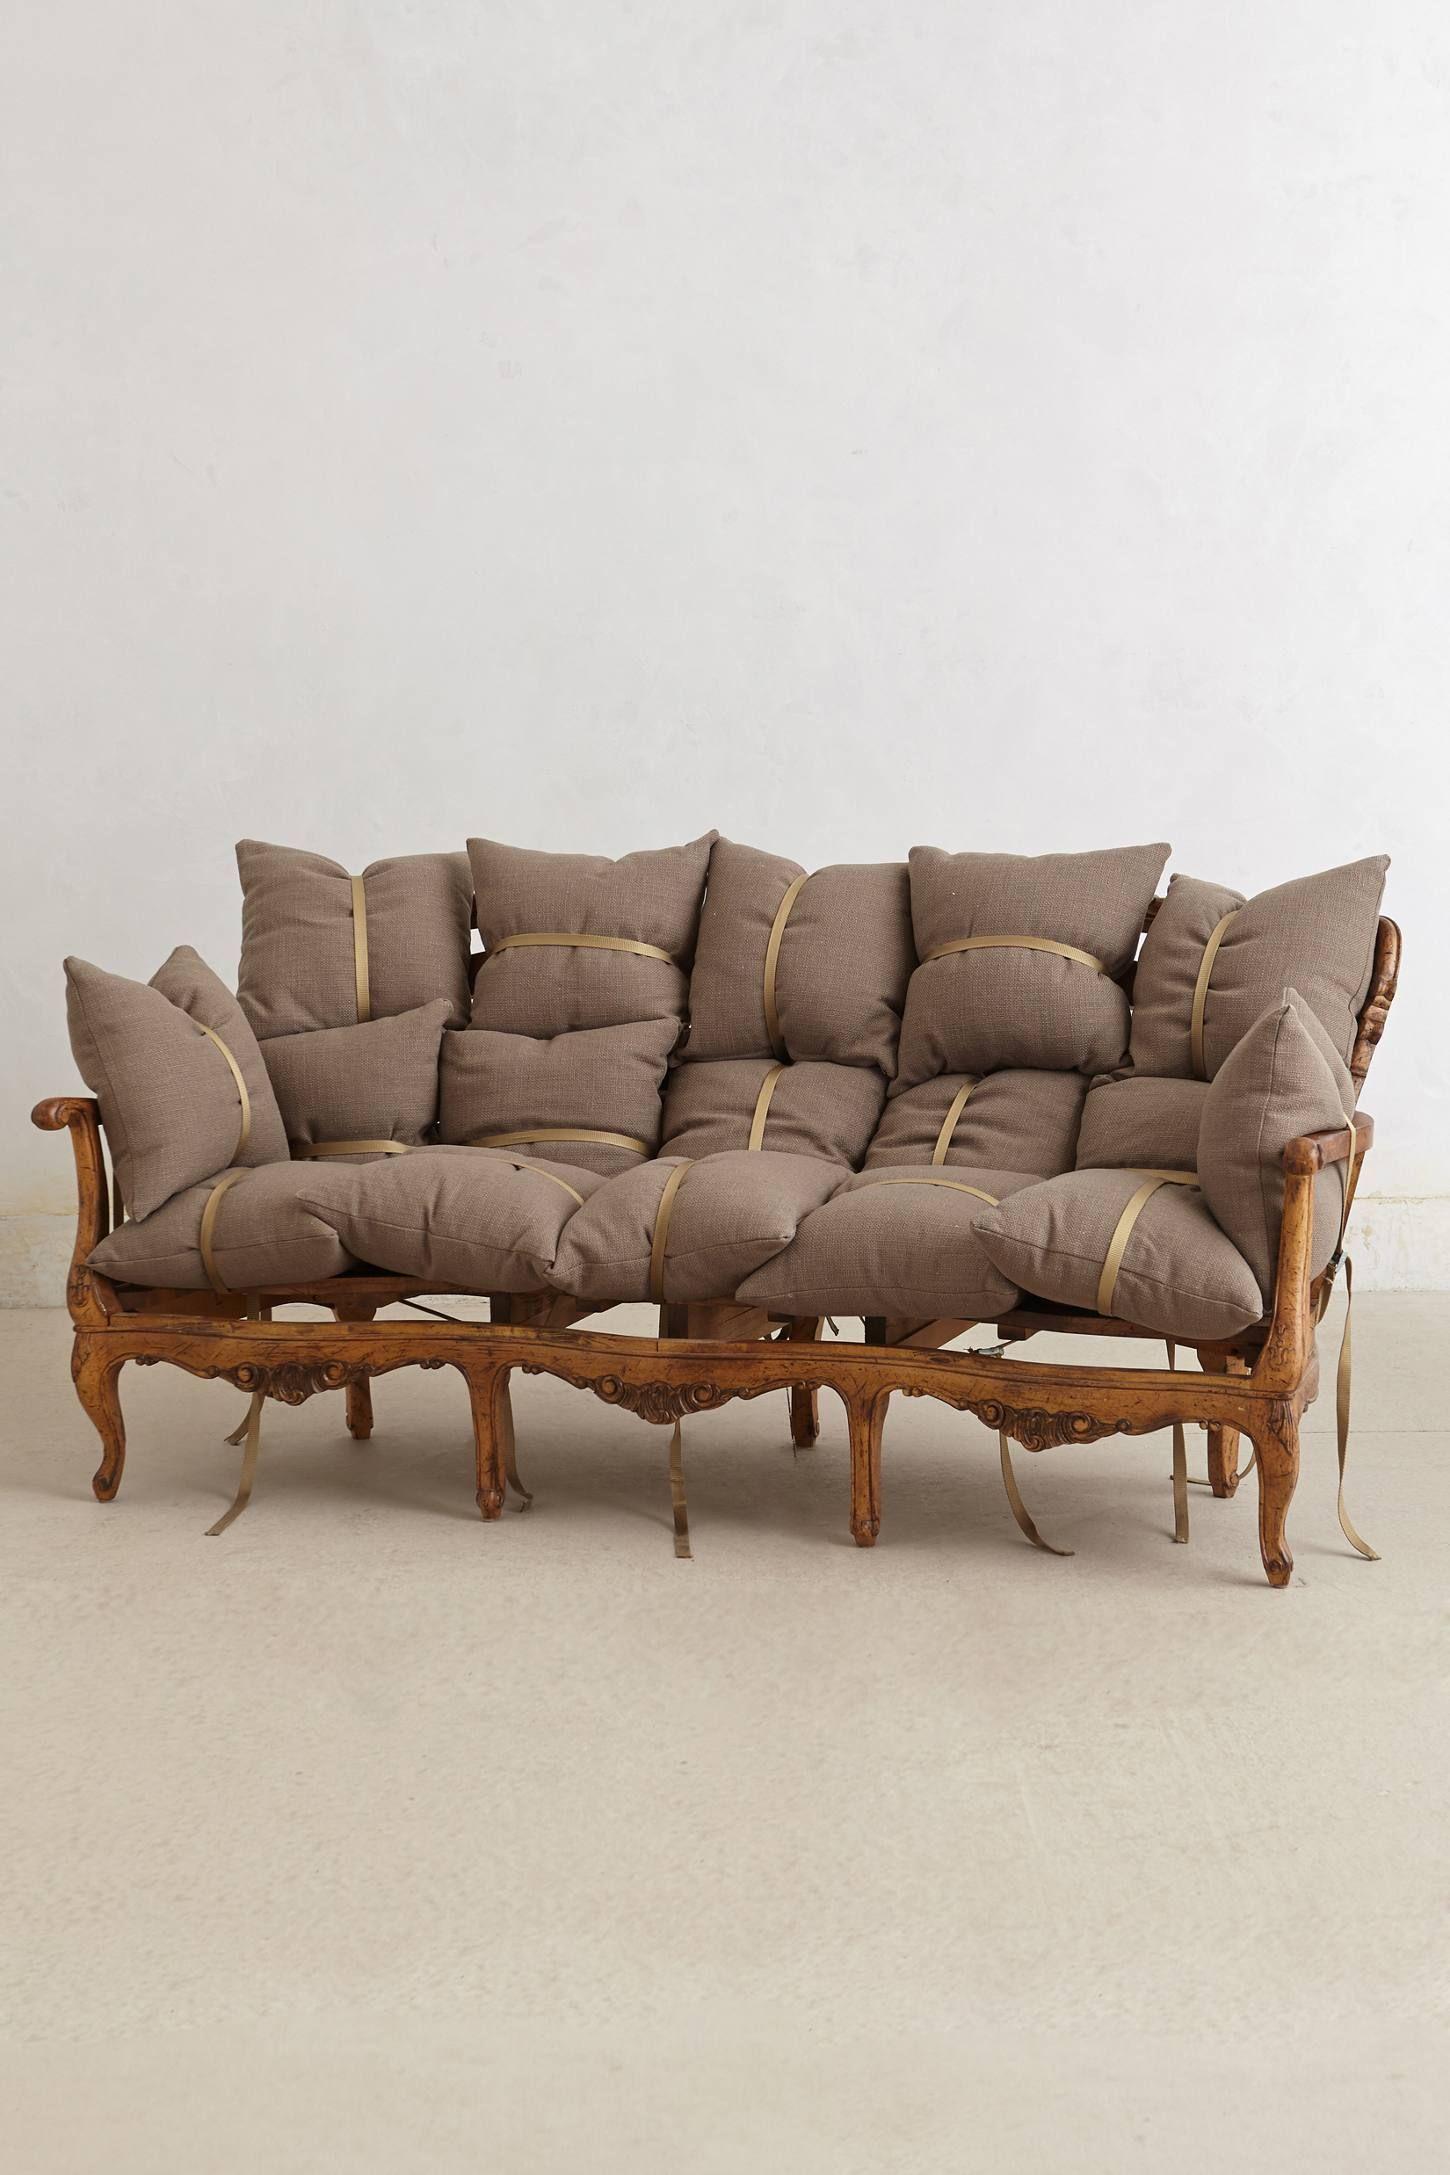 Deconstructed Sofa Sofa Diy Furniture Furniture